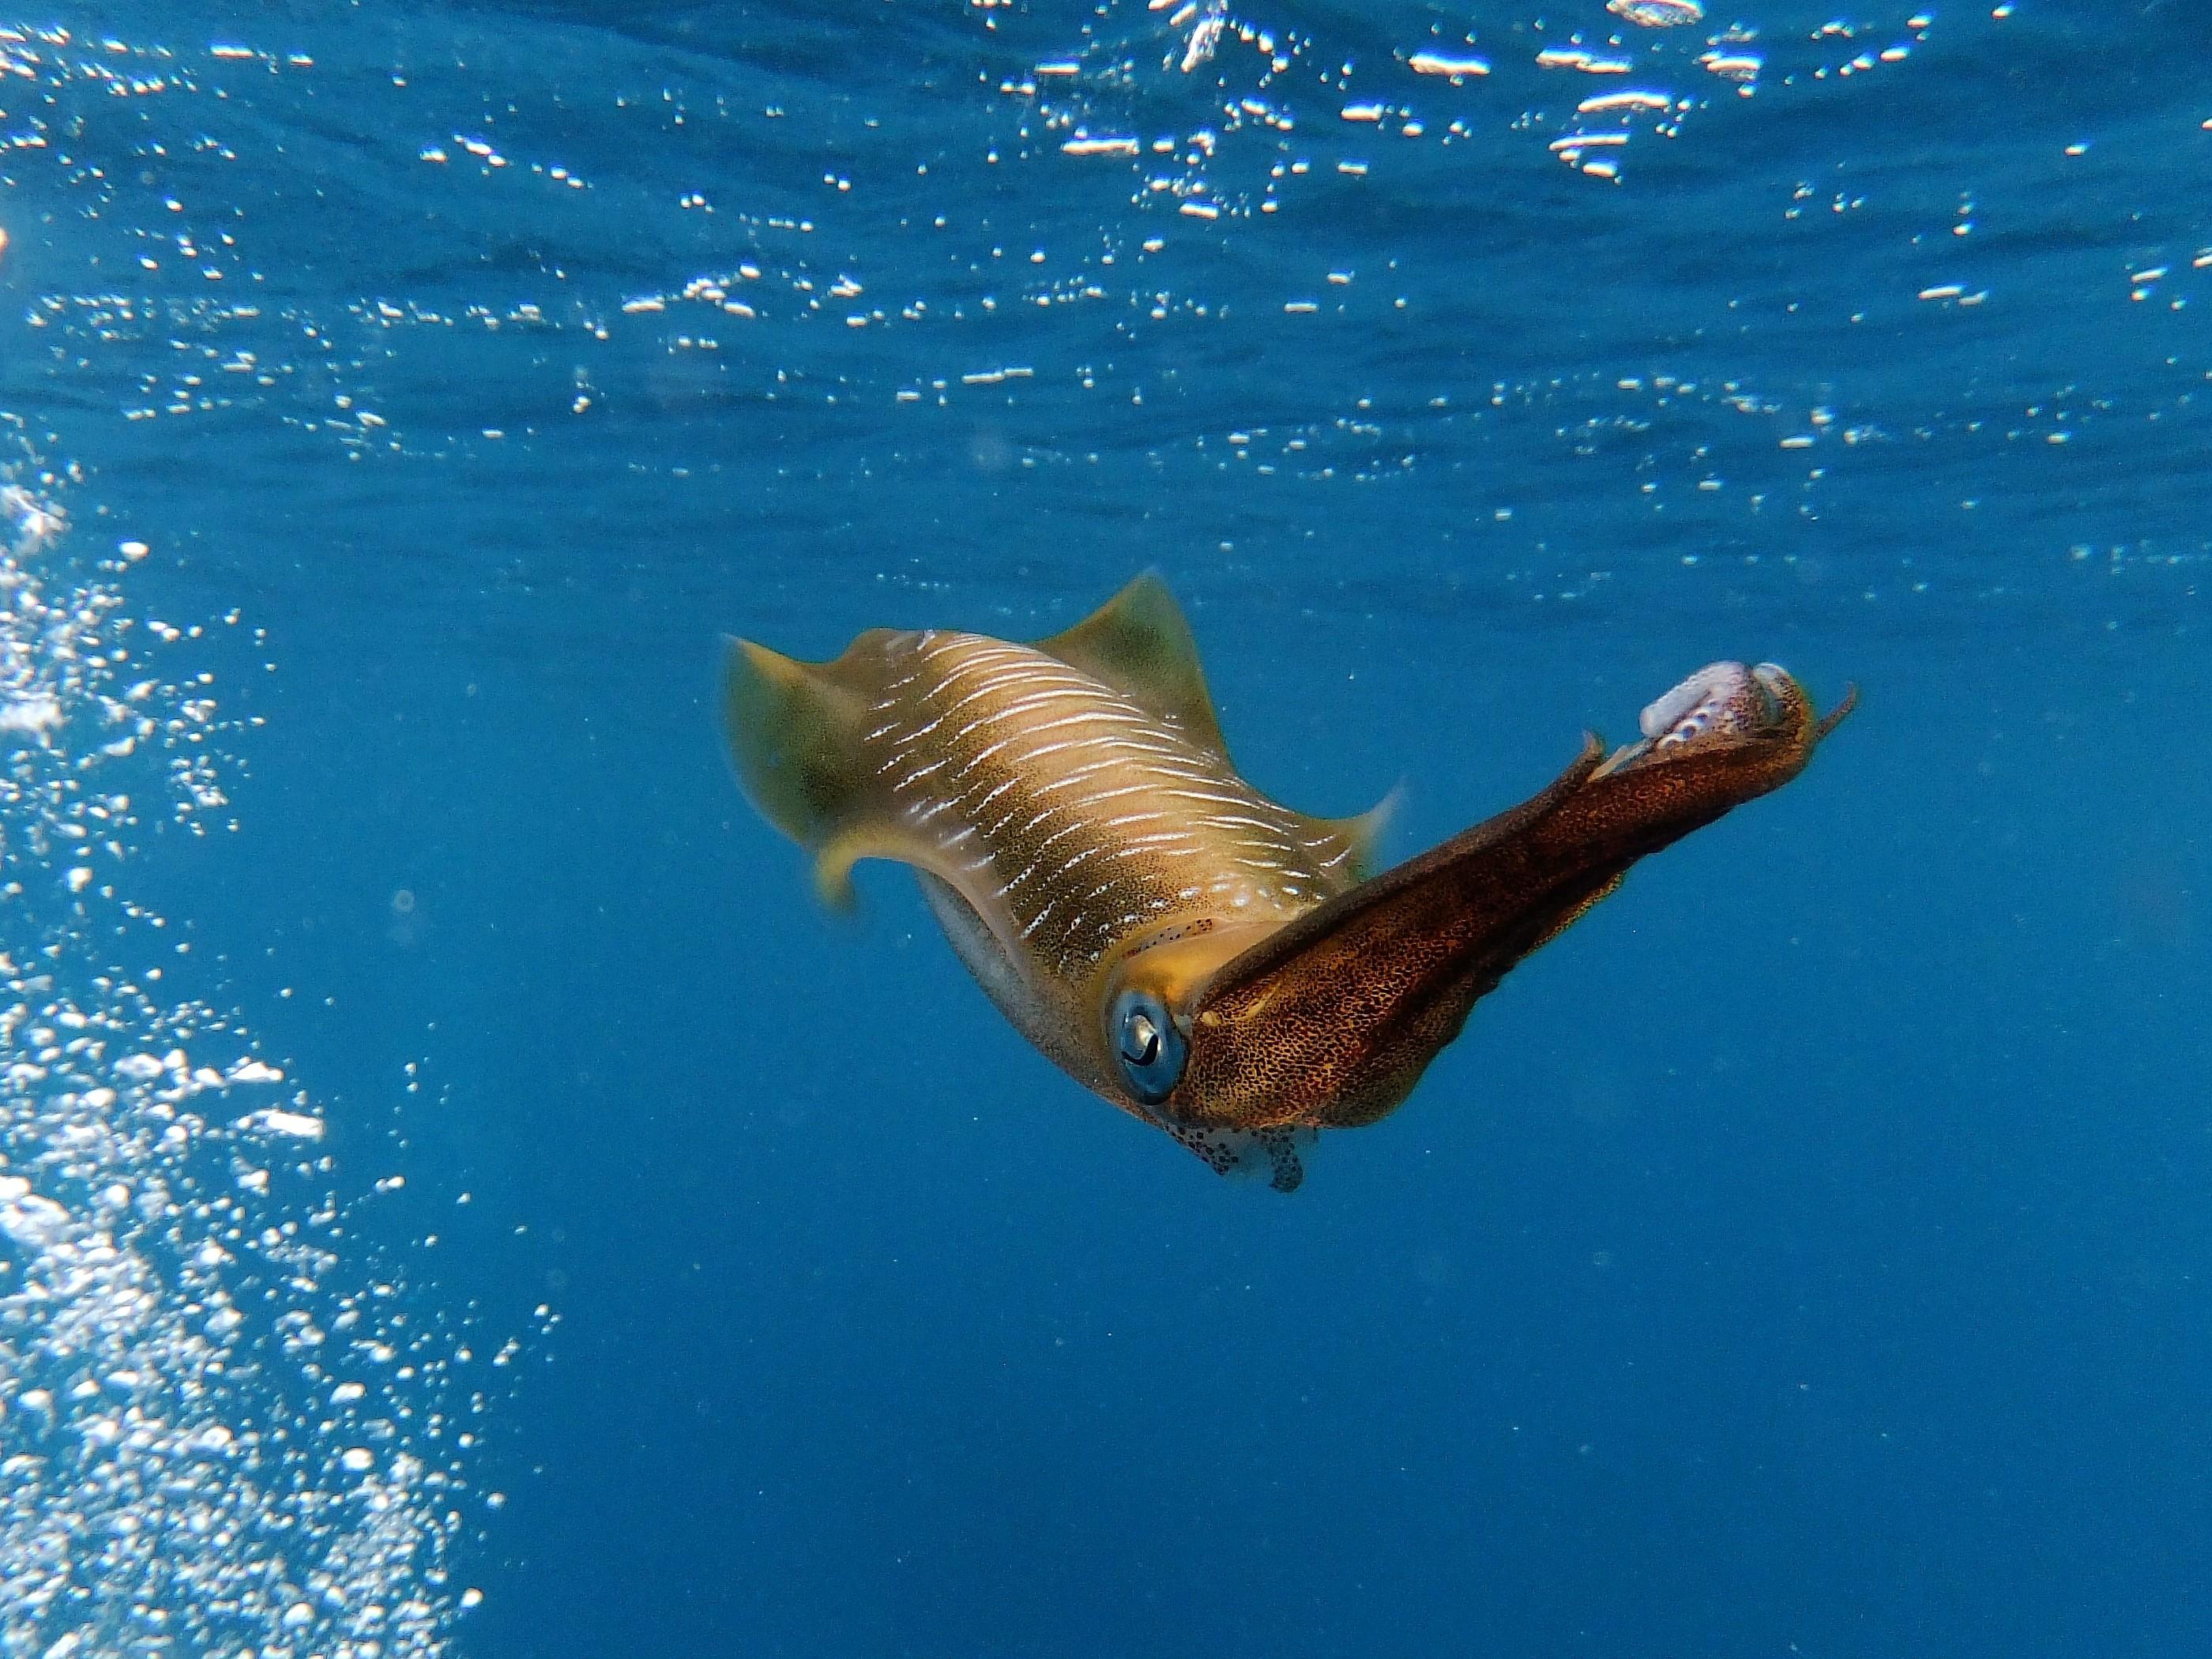 """Cuttlefish"" by Sarah Turpin"